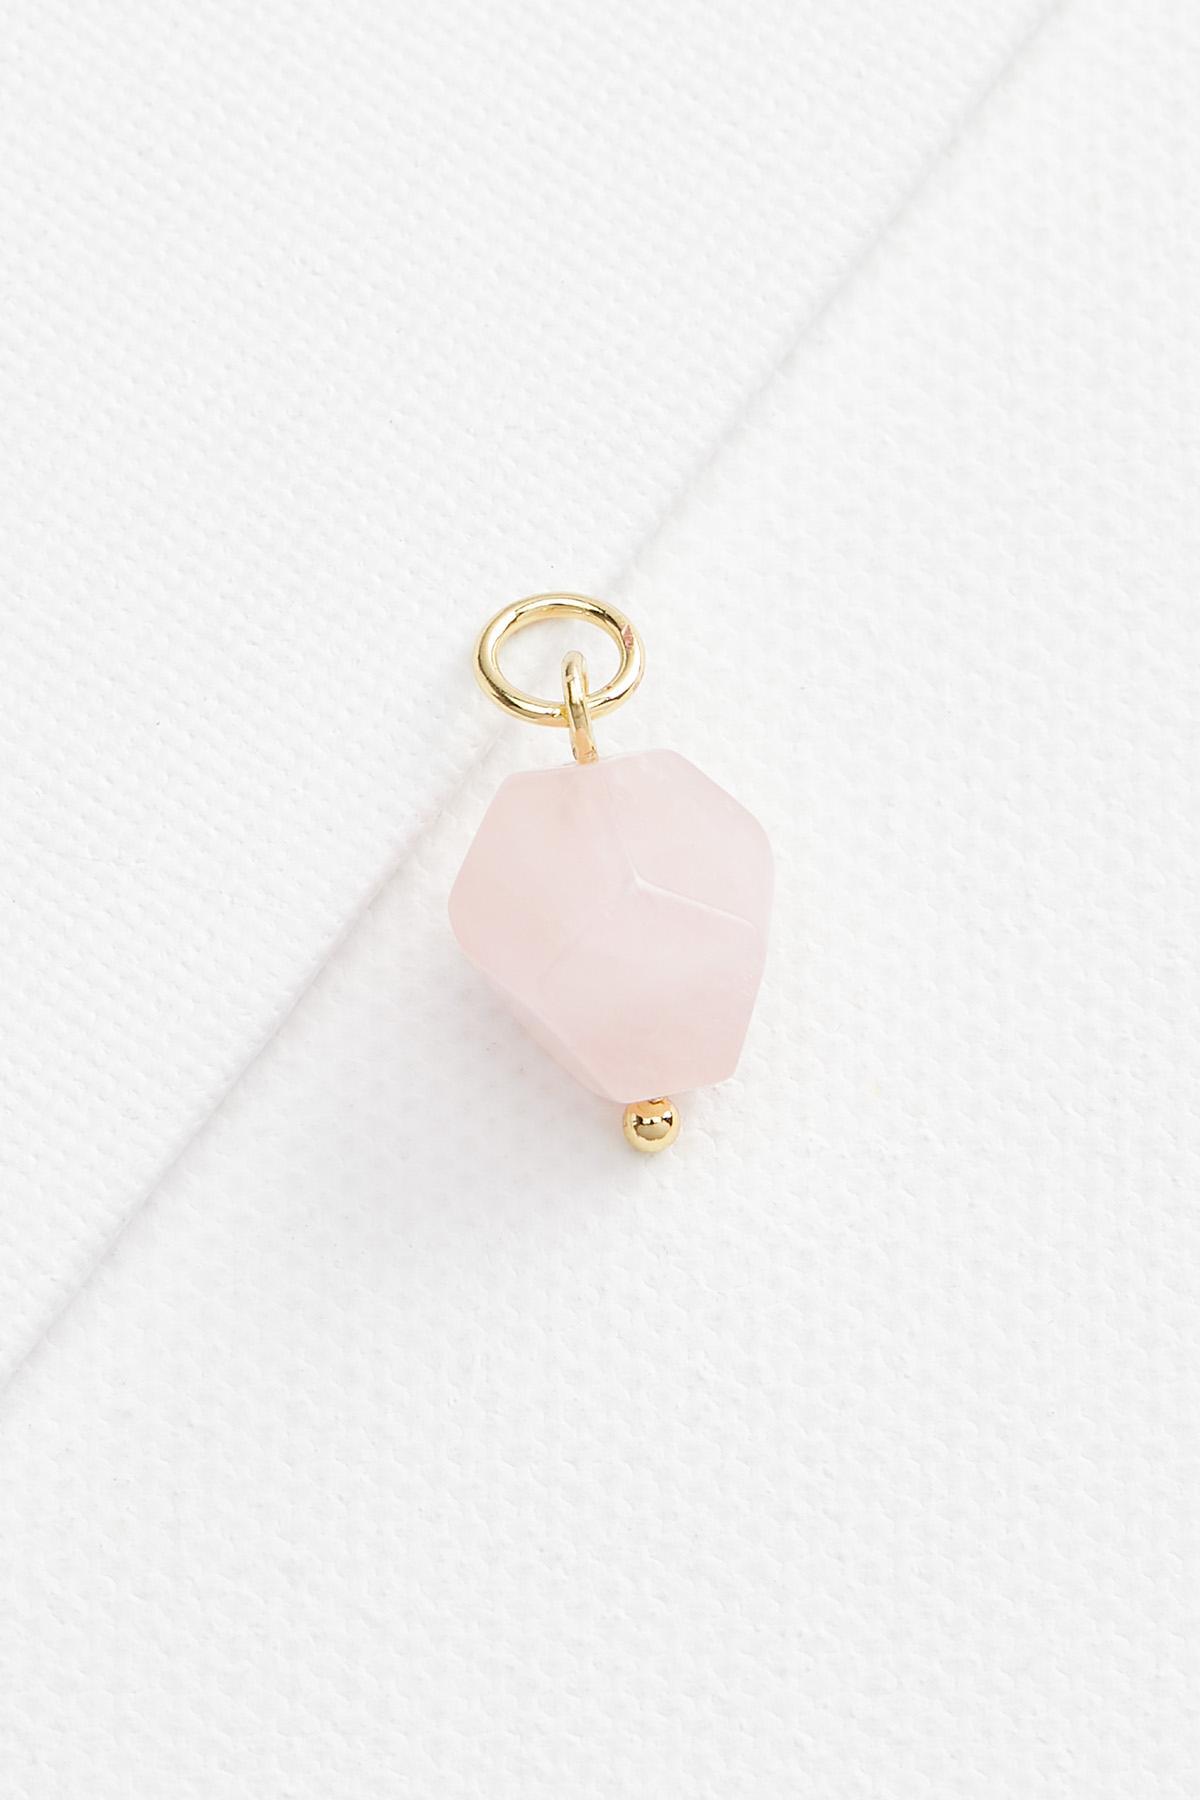 18k Semi Precious Stone Charm